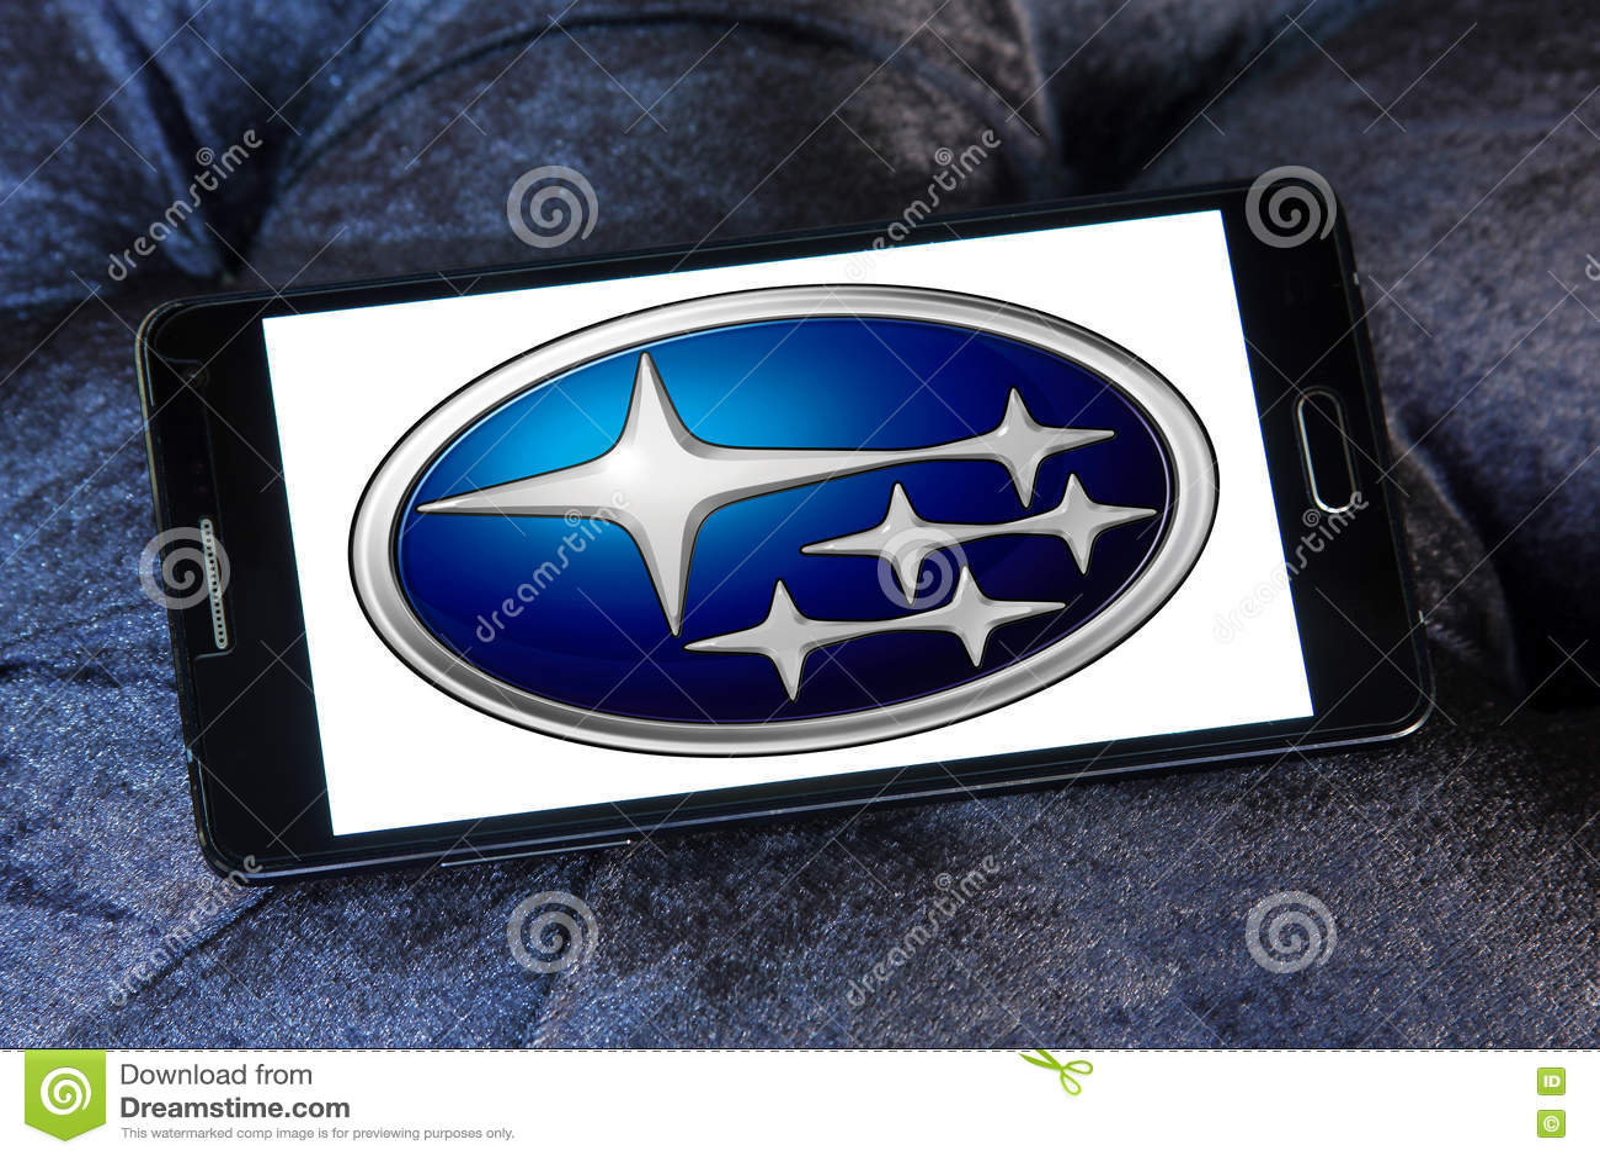 Subaru Car Logo Editorial Stock Photo Image Of Subaru 76895068